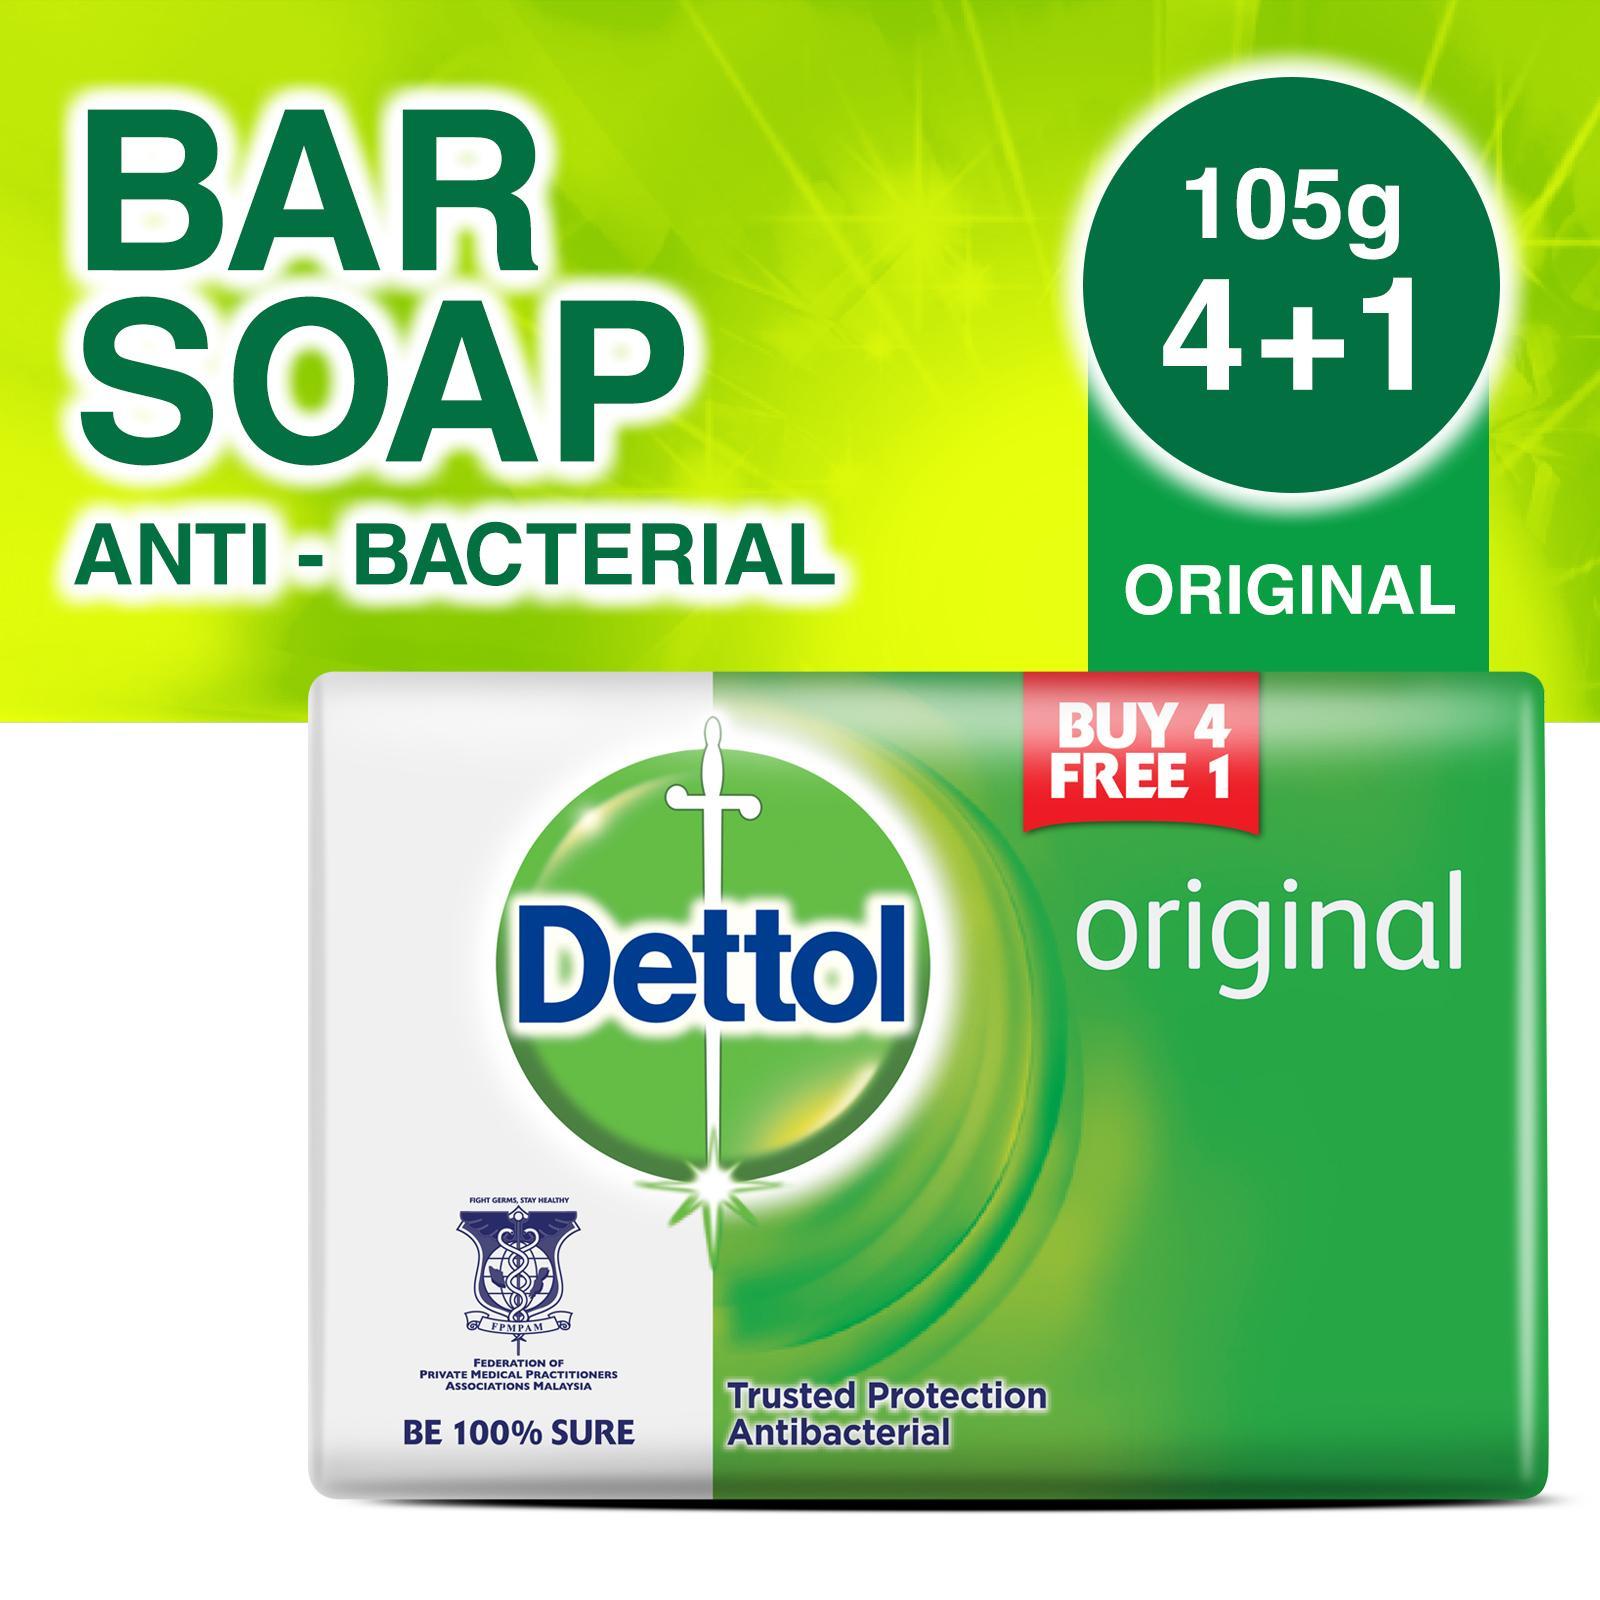 4+1 free Dettol Anti-Bacterial Bar Soap Original 105G